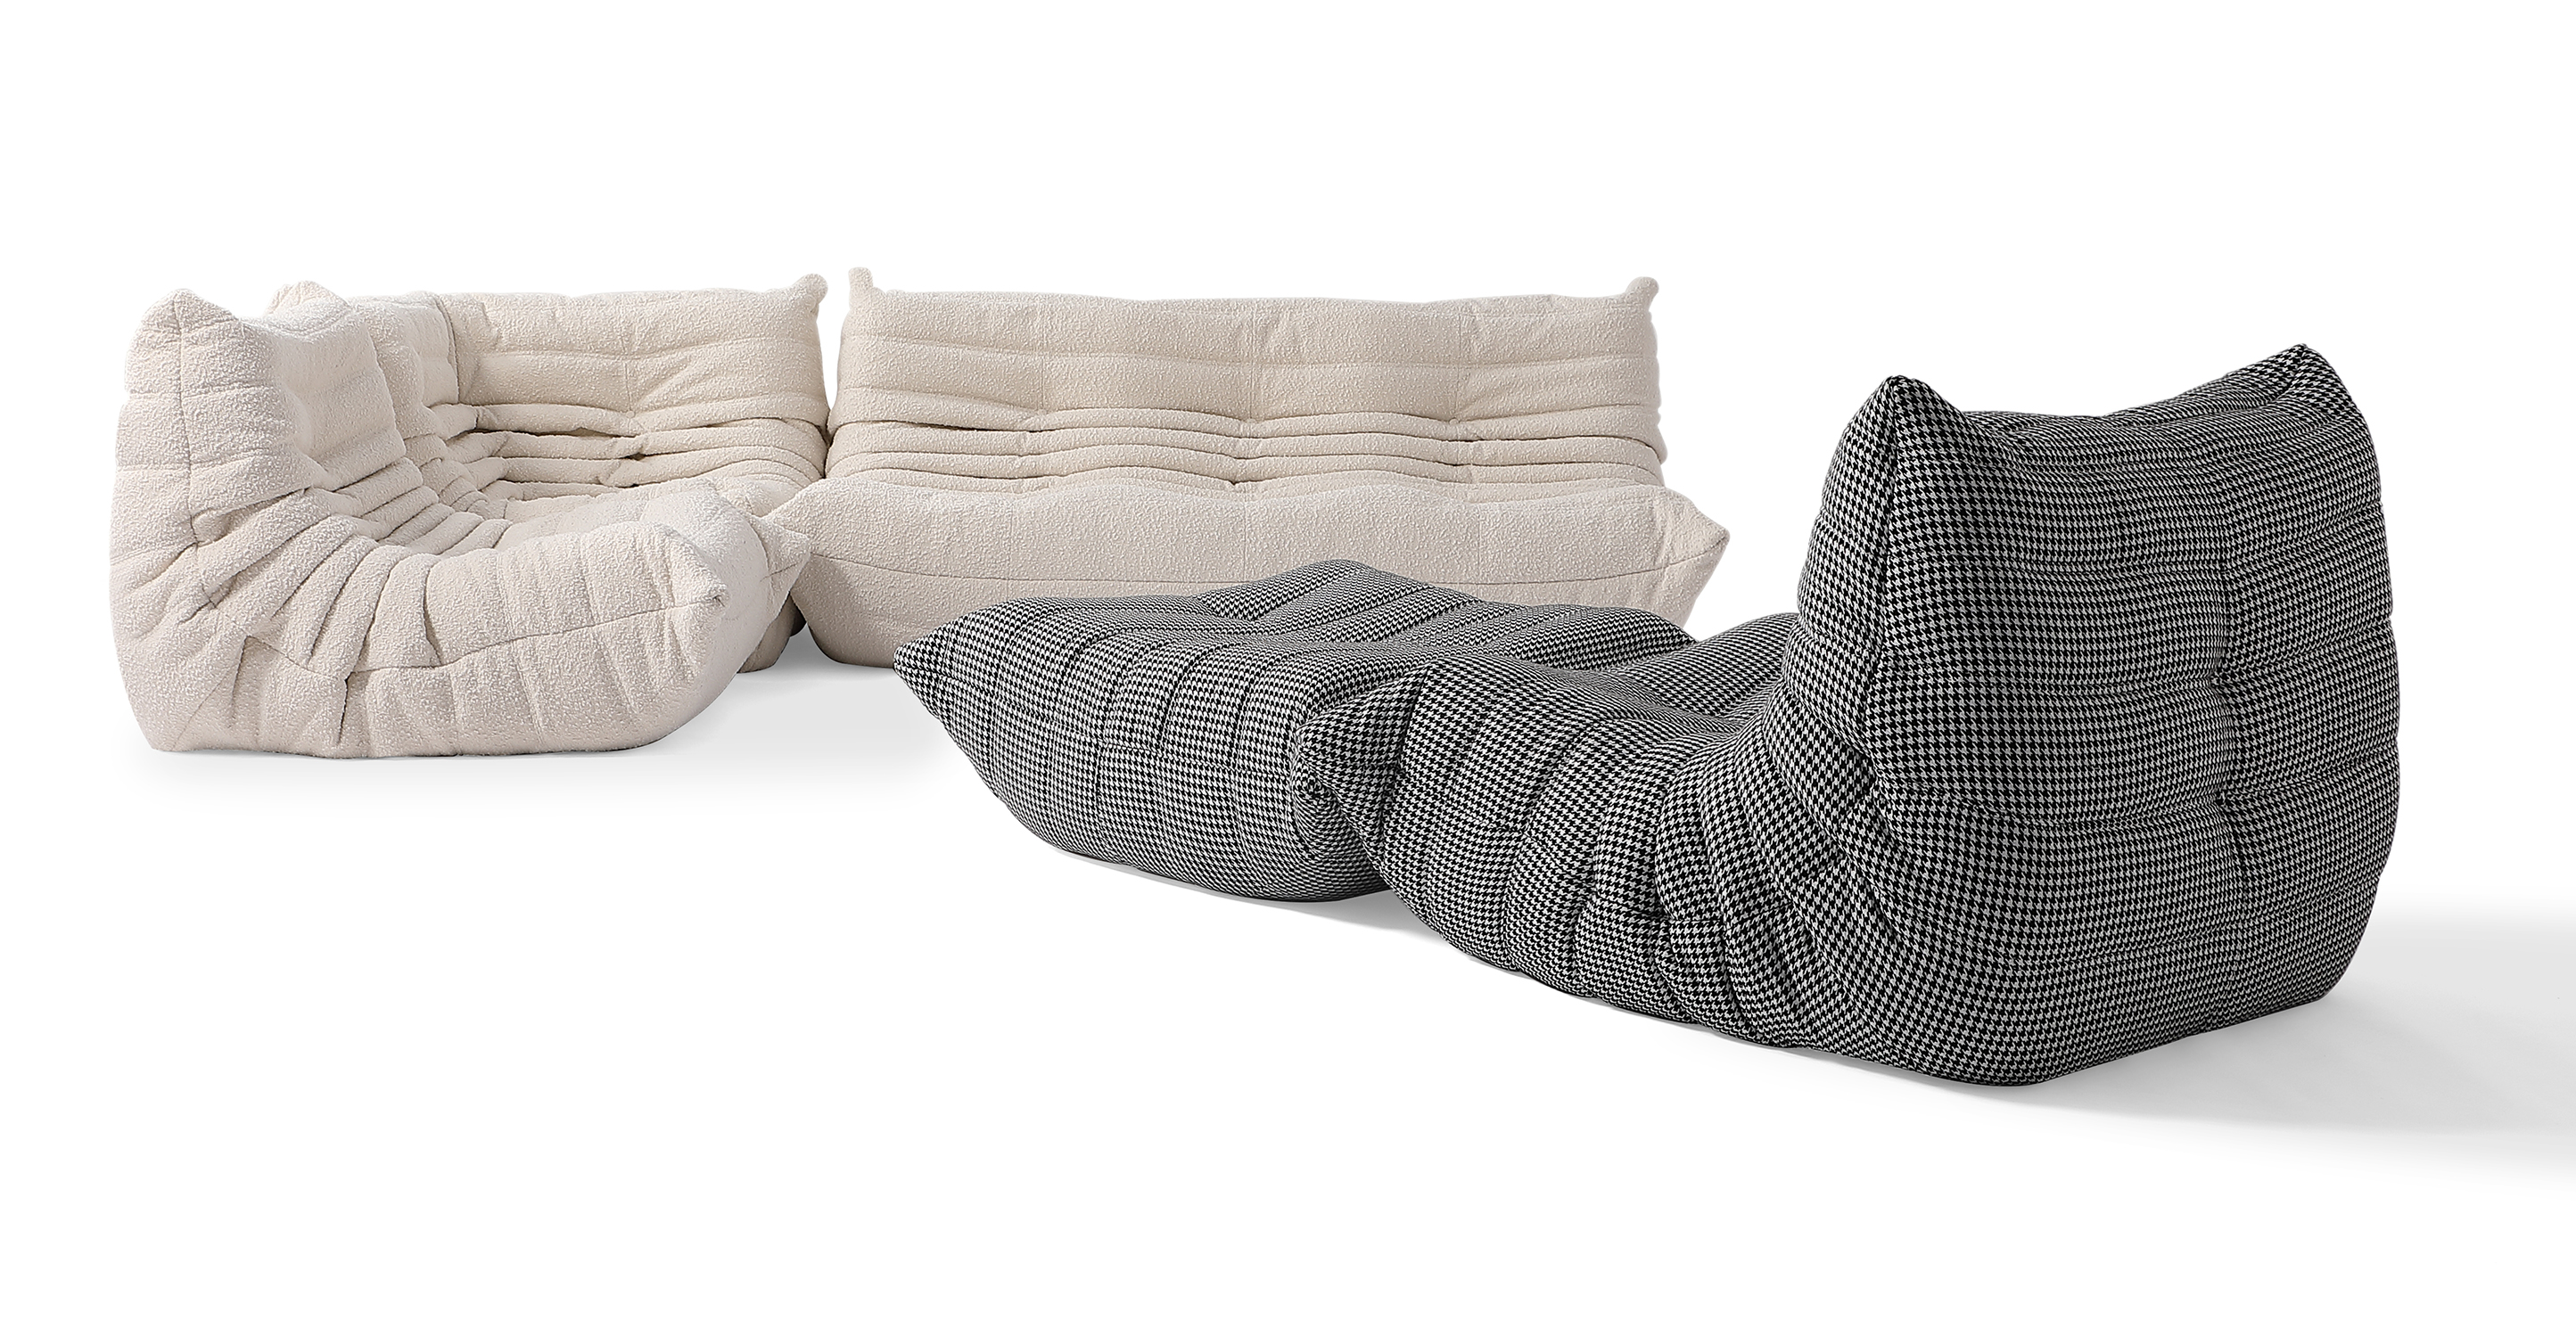 "Louvre Modular 110"" Milo 5-pc Fabric Sofa,Blanc & Houndstooth"